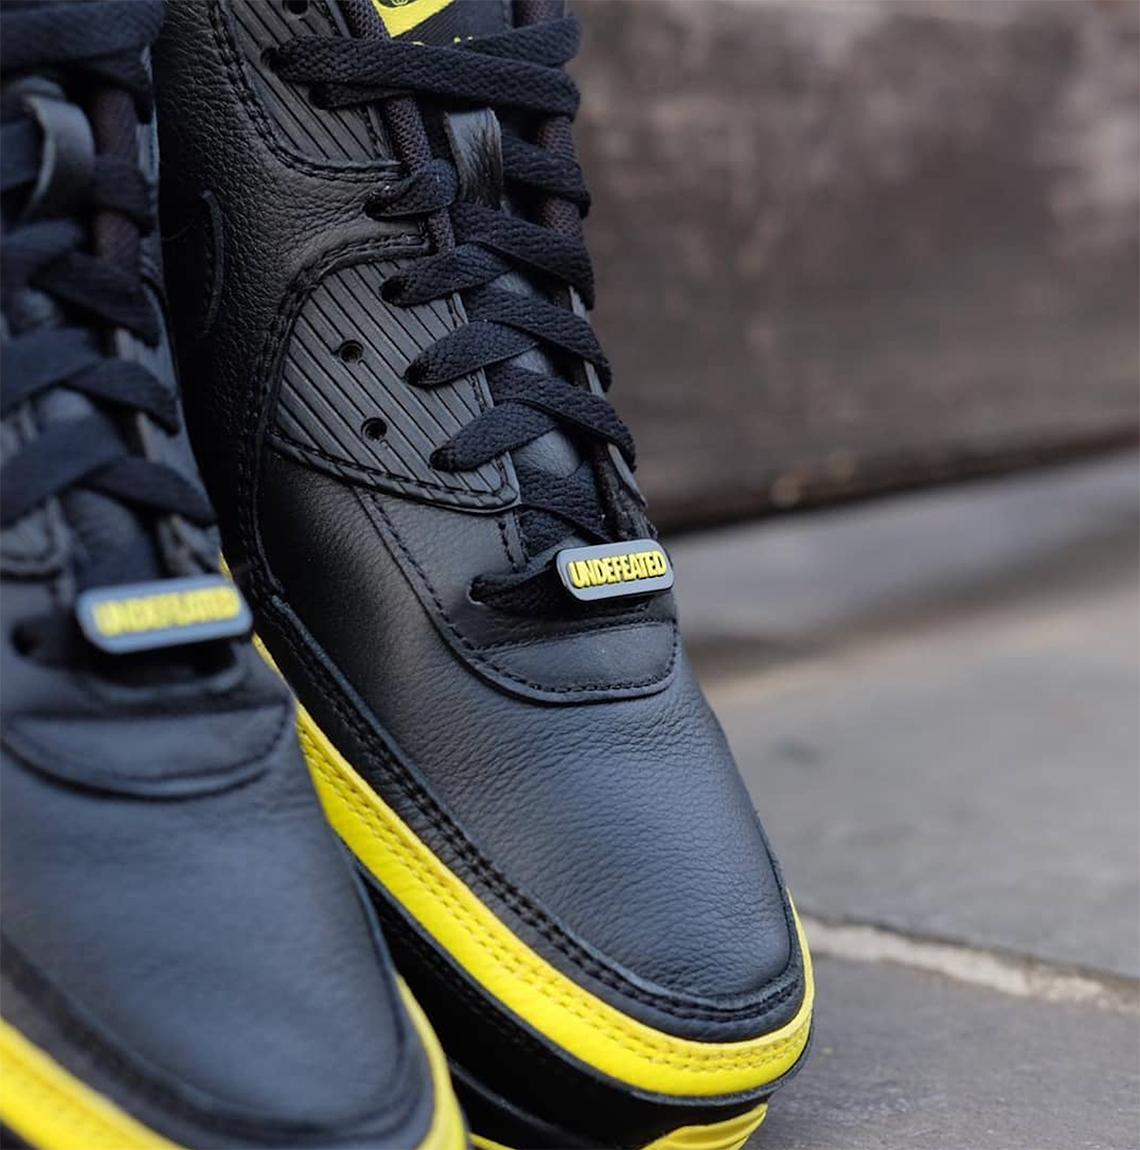 Nike Air Max 90 UNDEFEATED CJ7197 001 |